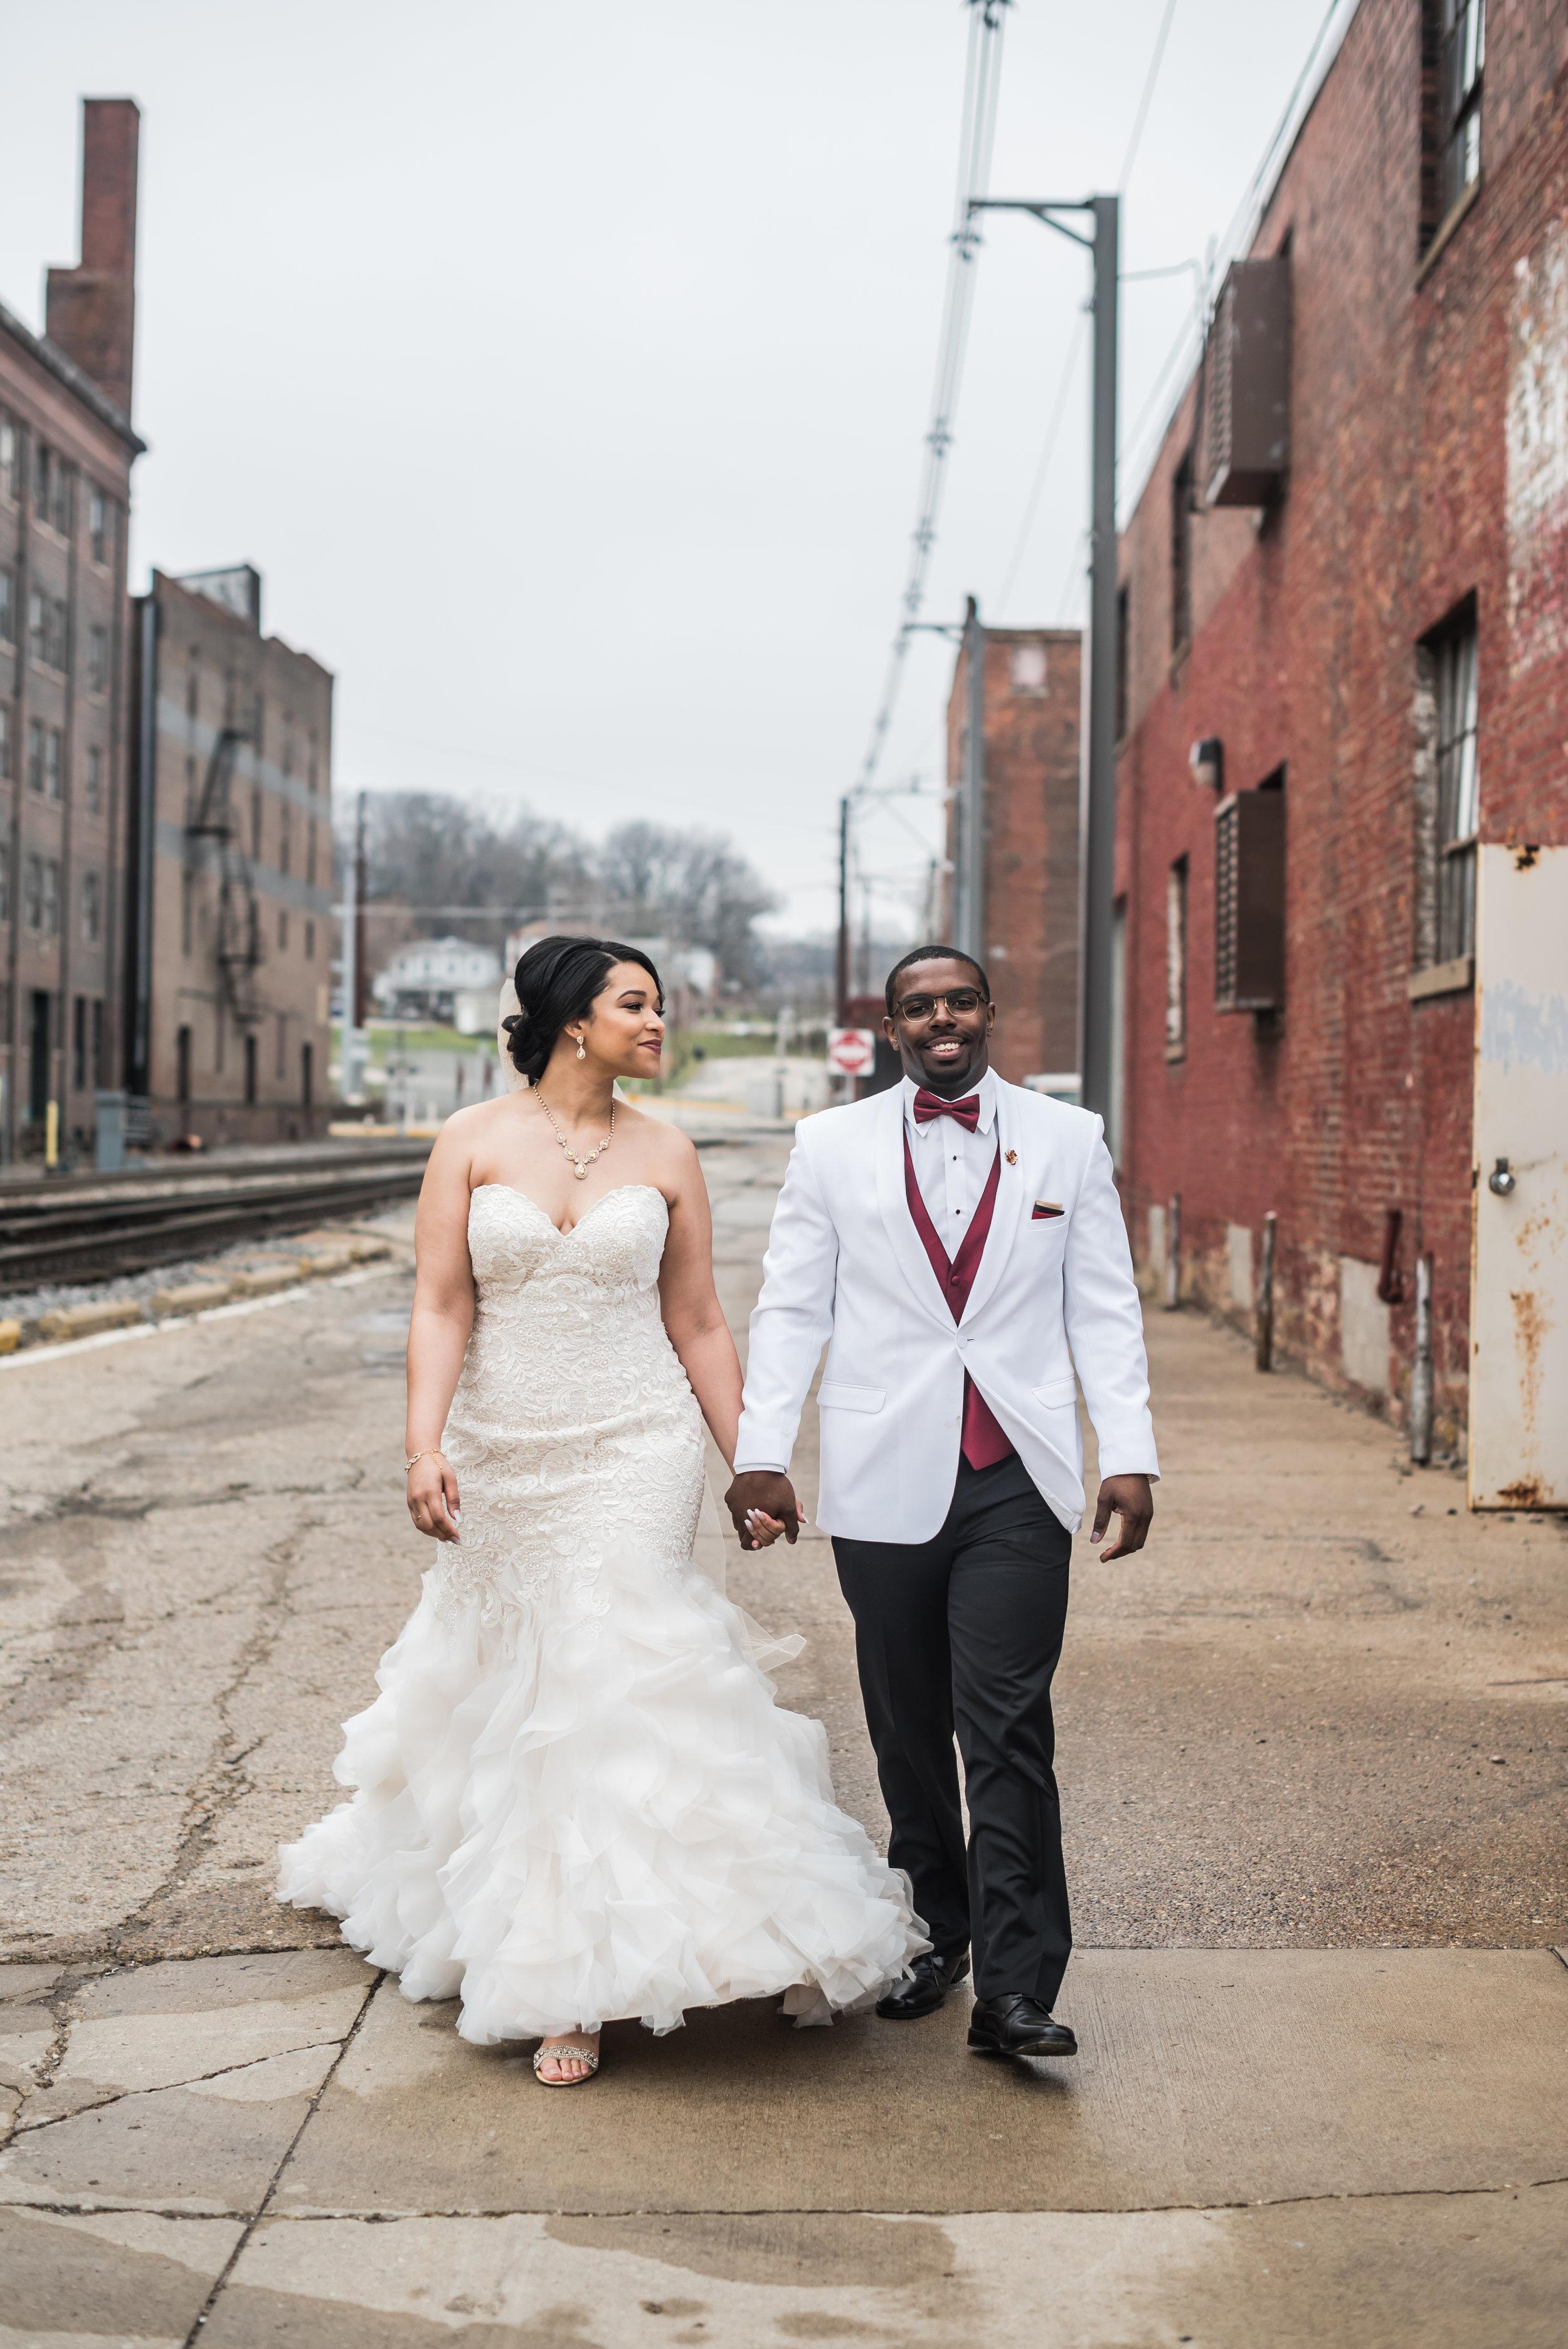 Burlington Iowa Wedding Midwest Photographer Melissa Cervantes _ Chantelle and Isaiah 243a.jpg